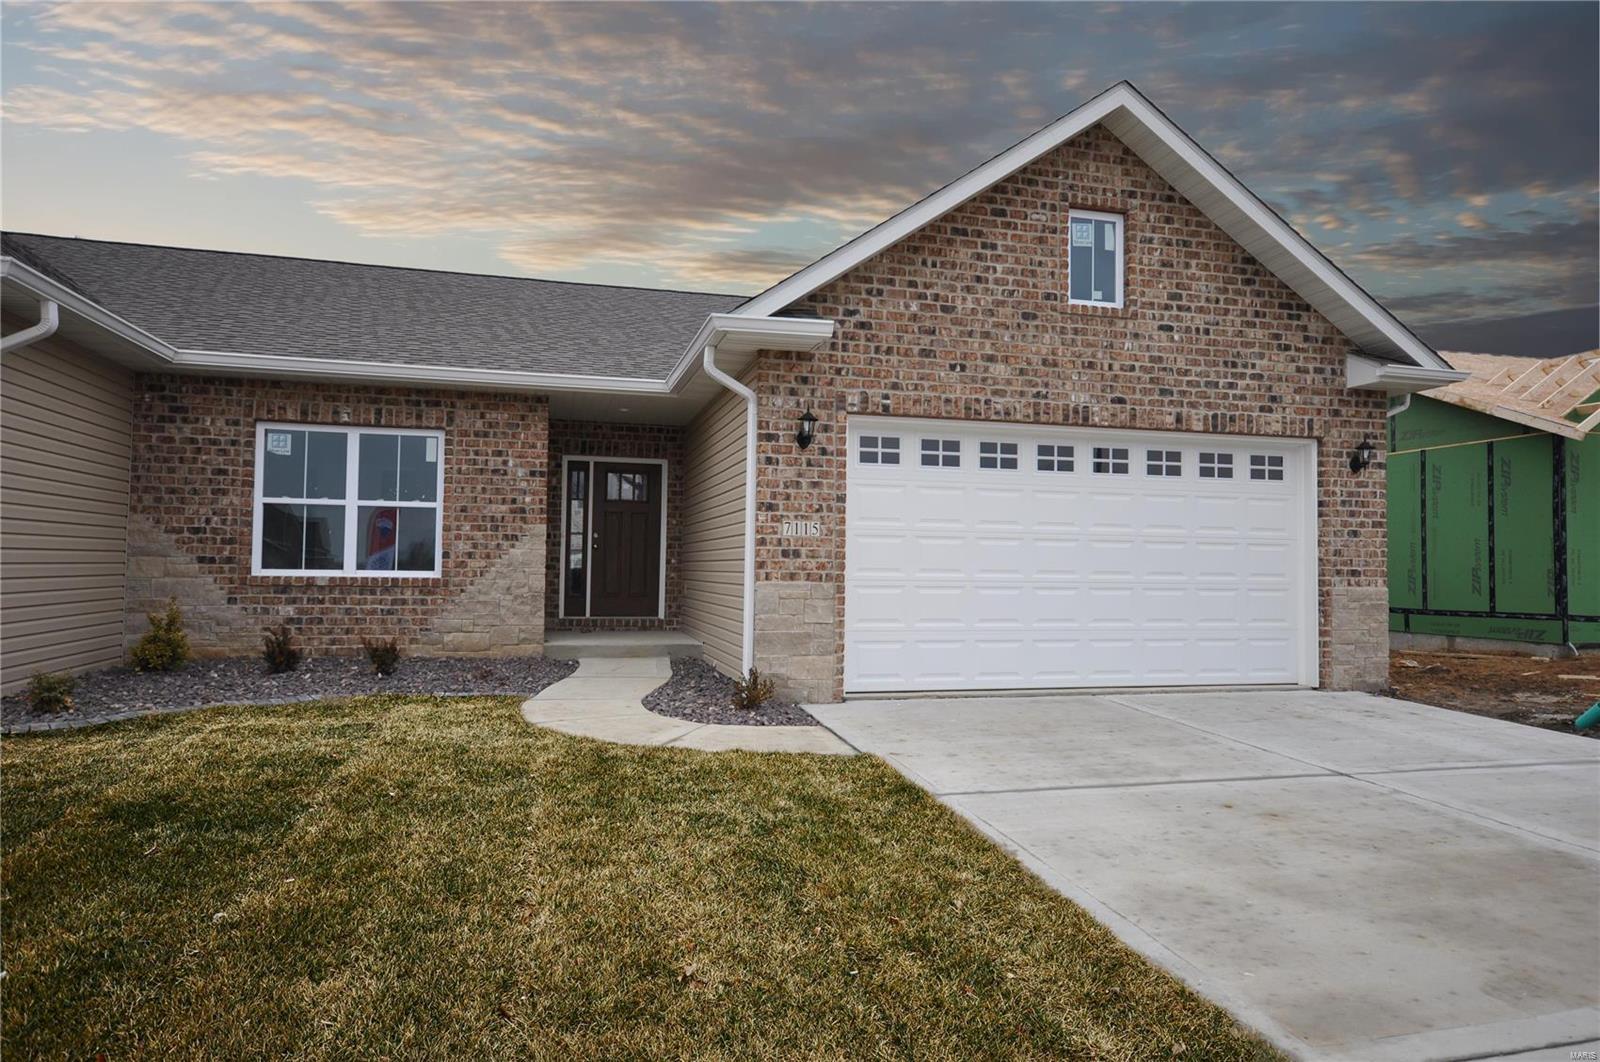 7115 Remington Villa Drive Property Photo - Maryville, IL real estate listing